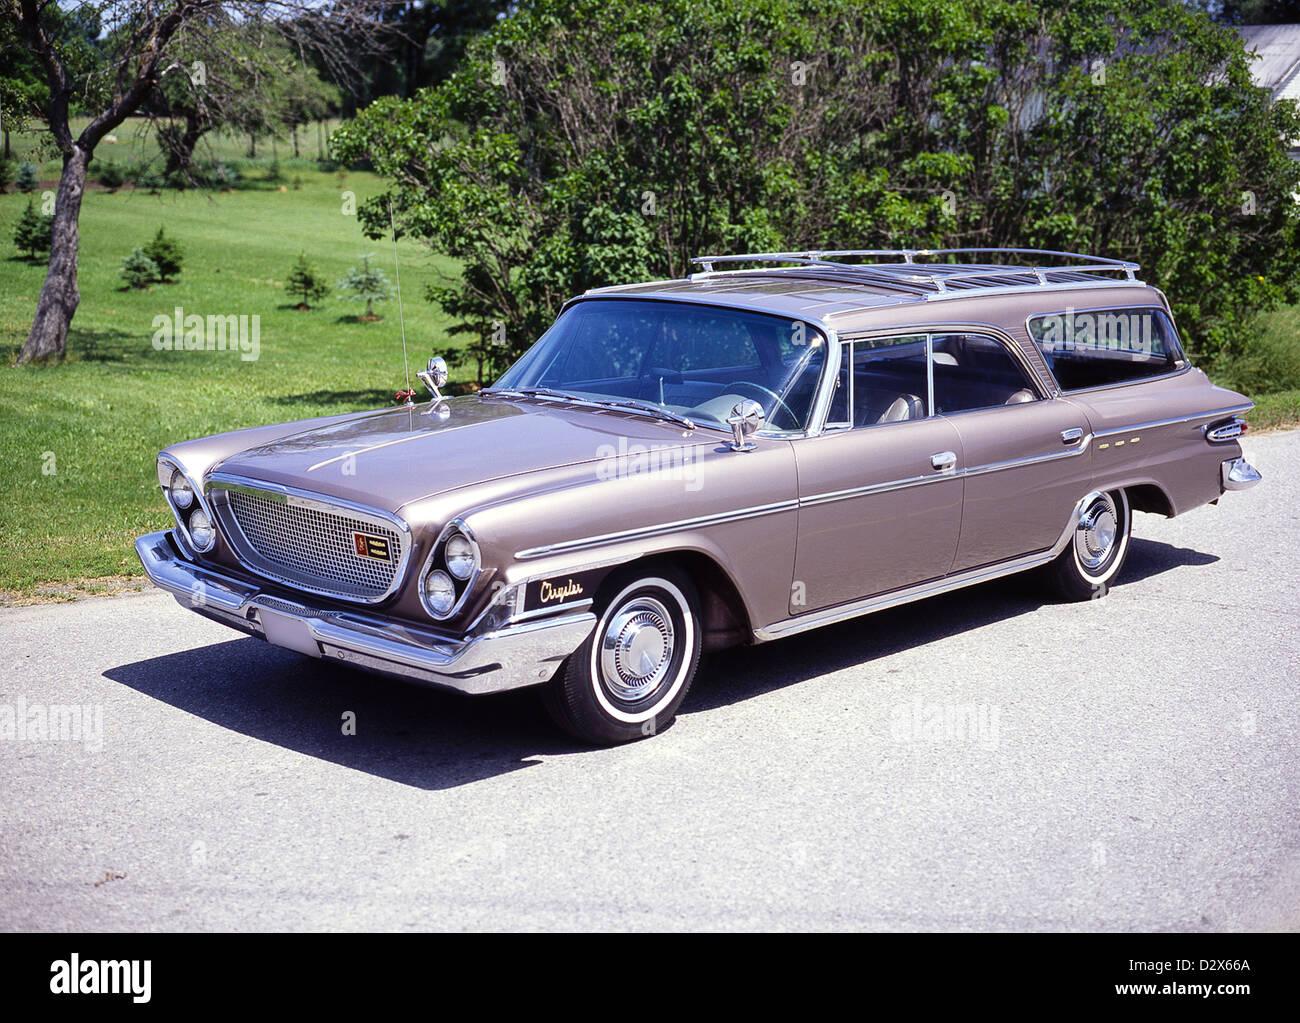 1962 Chrysler Newport Station Wagon